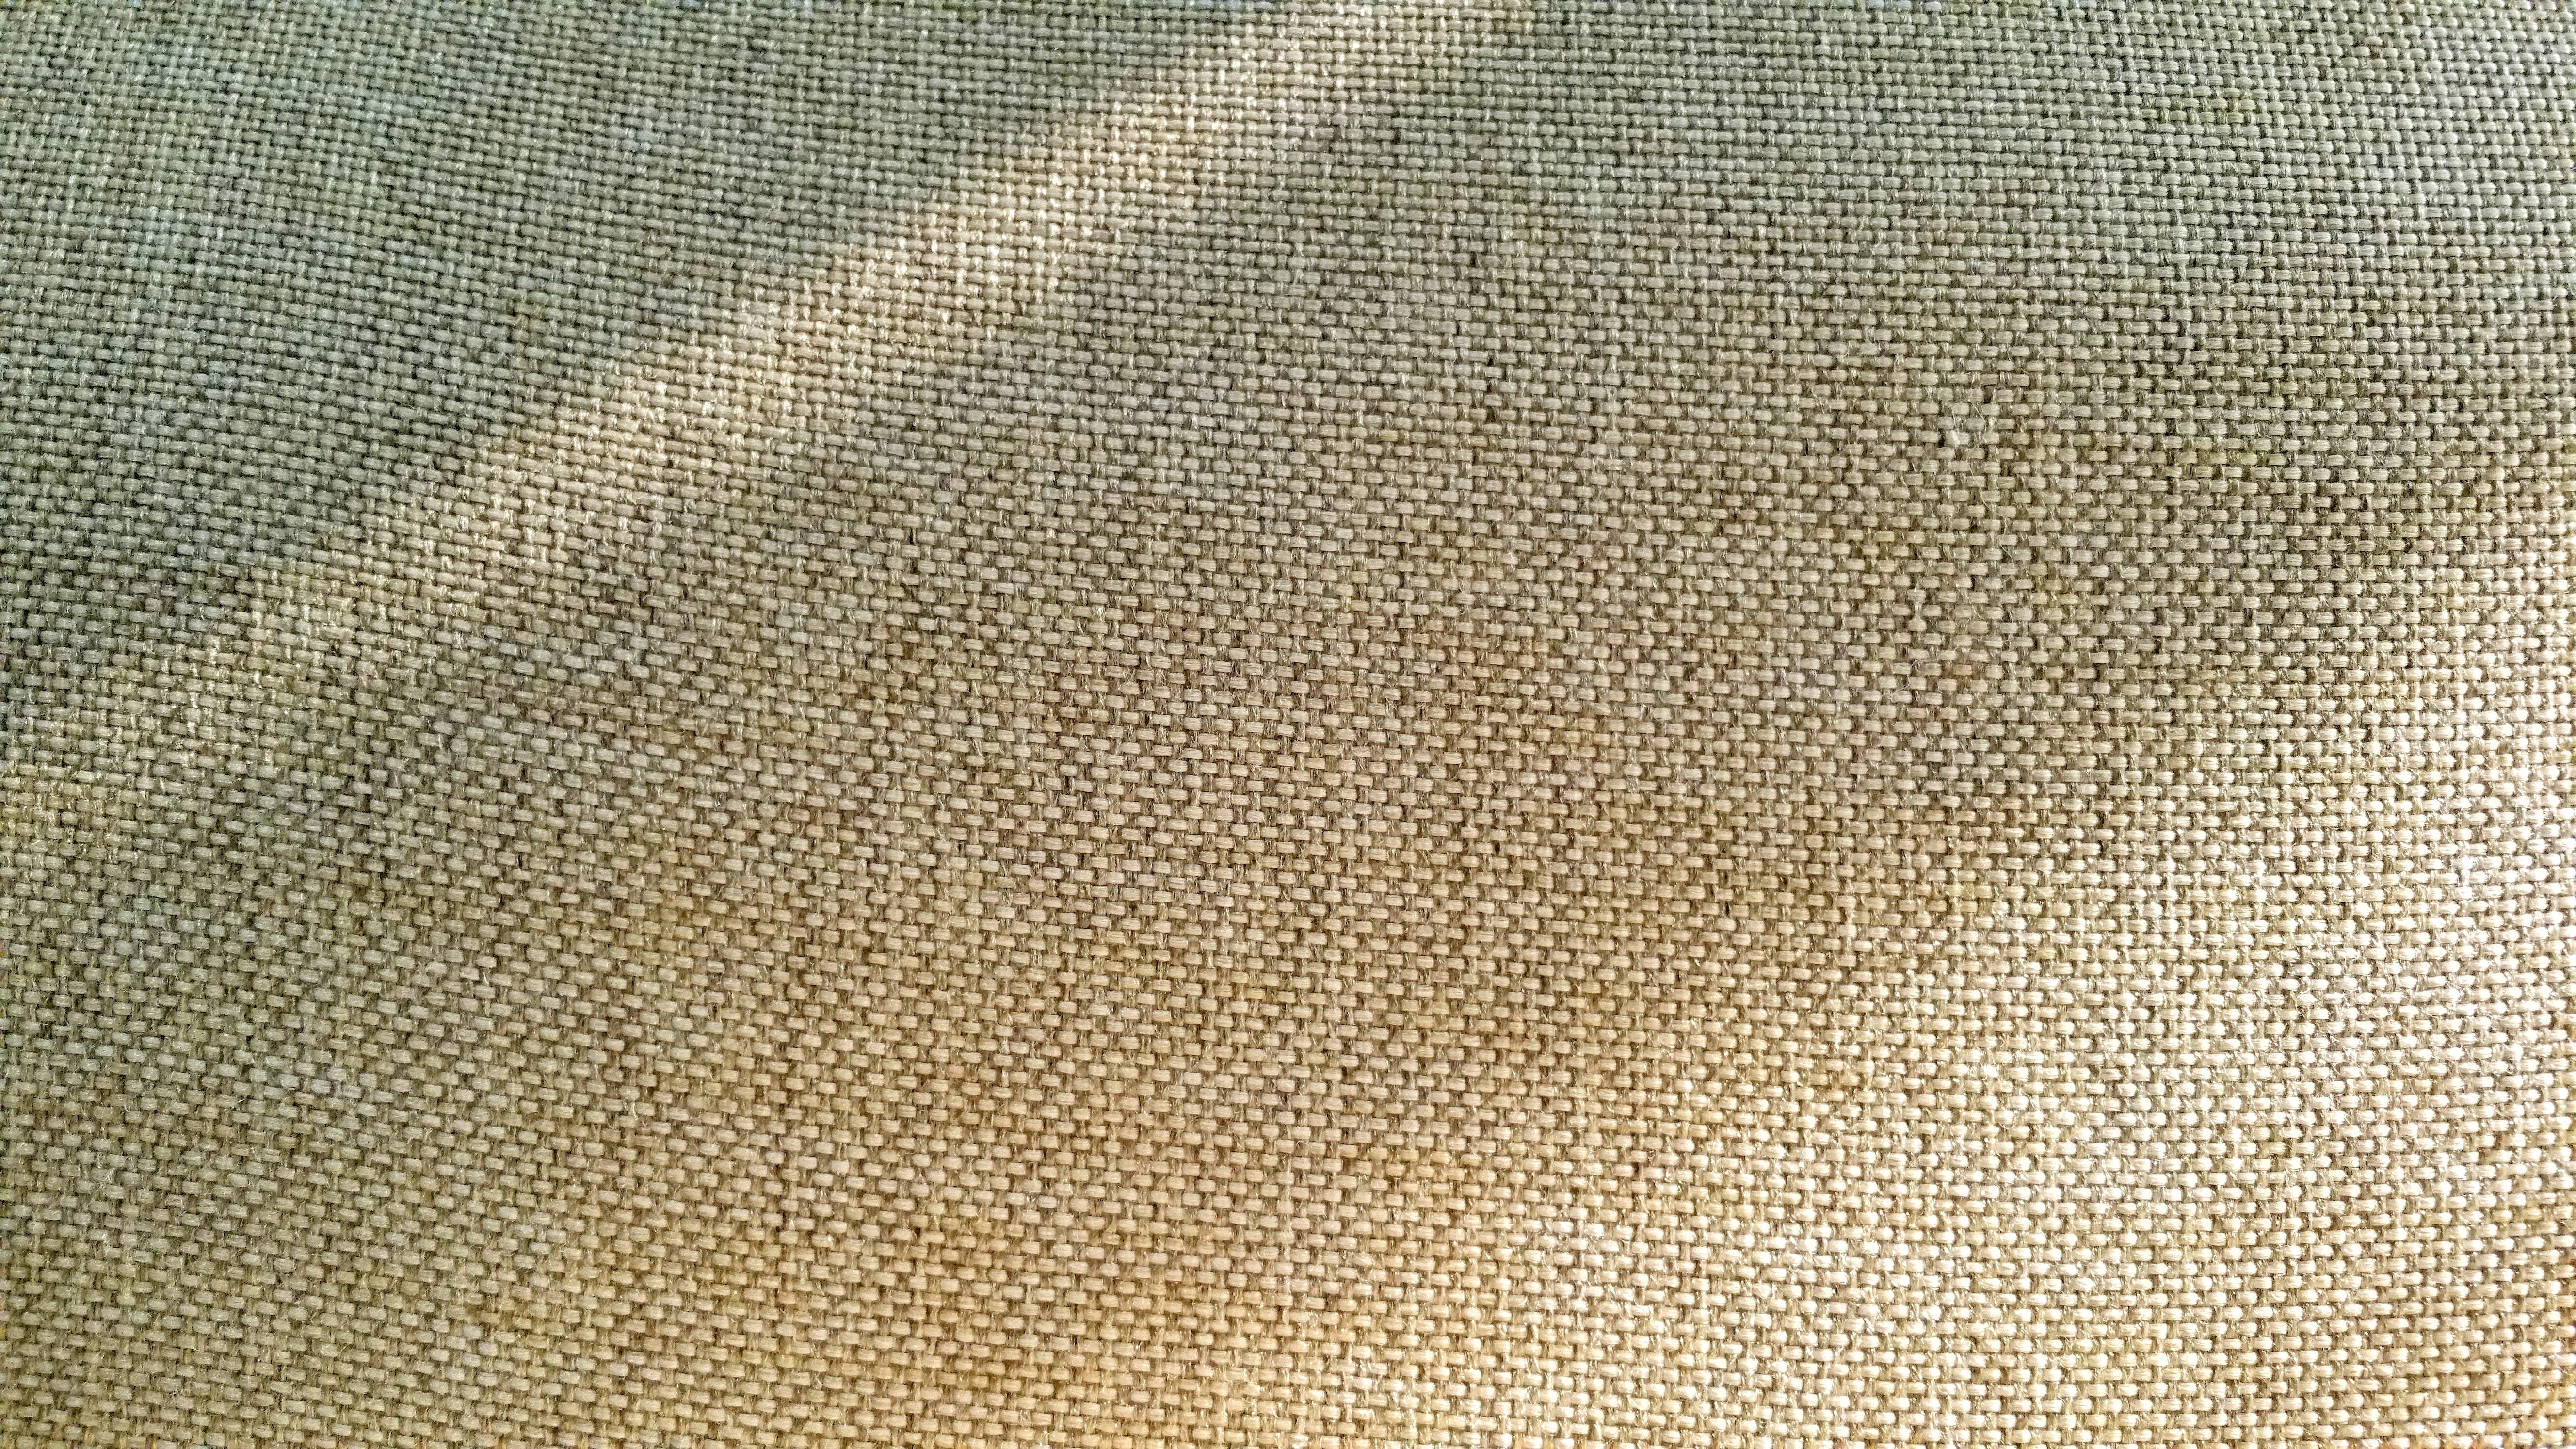 Free stock photo of sunny, sunshine, pattern, texture